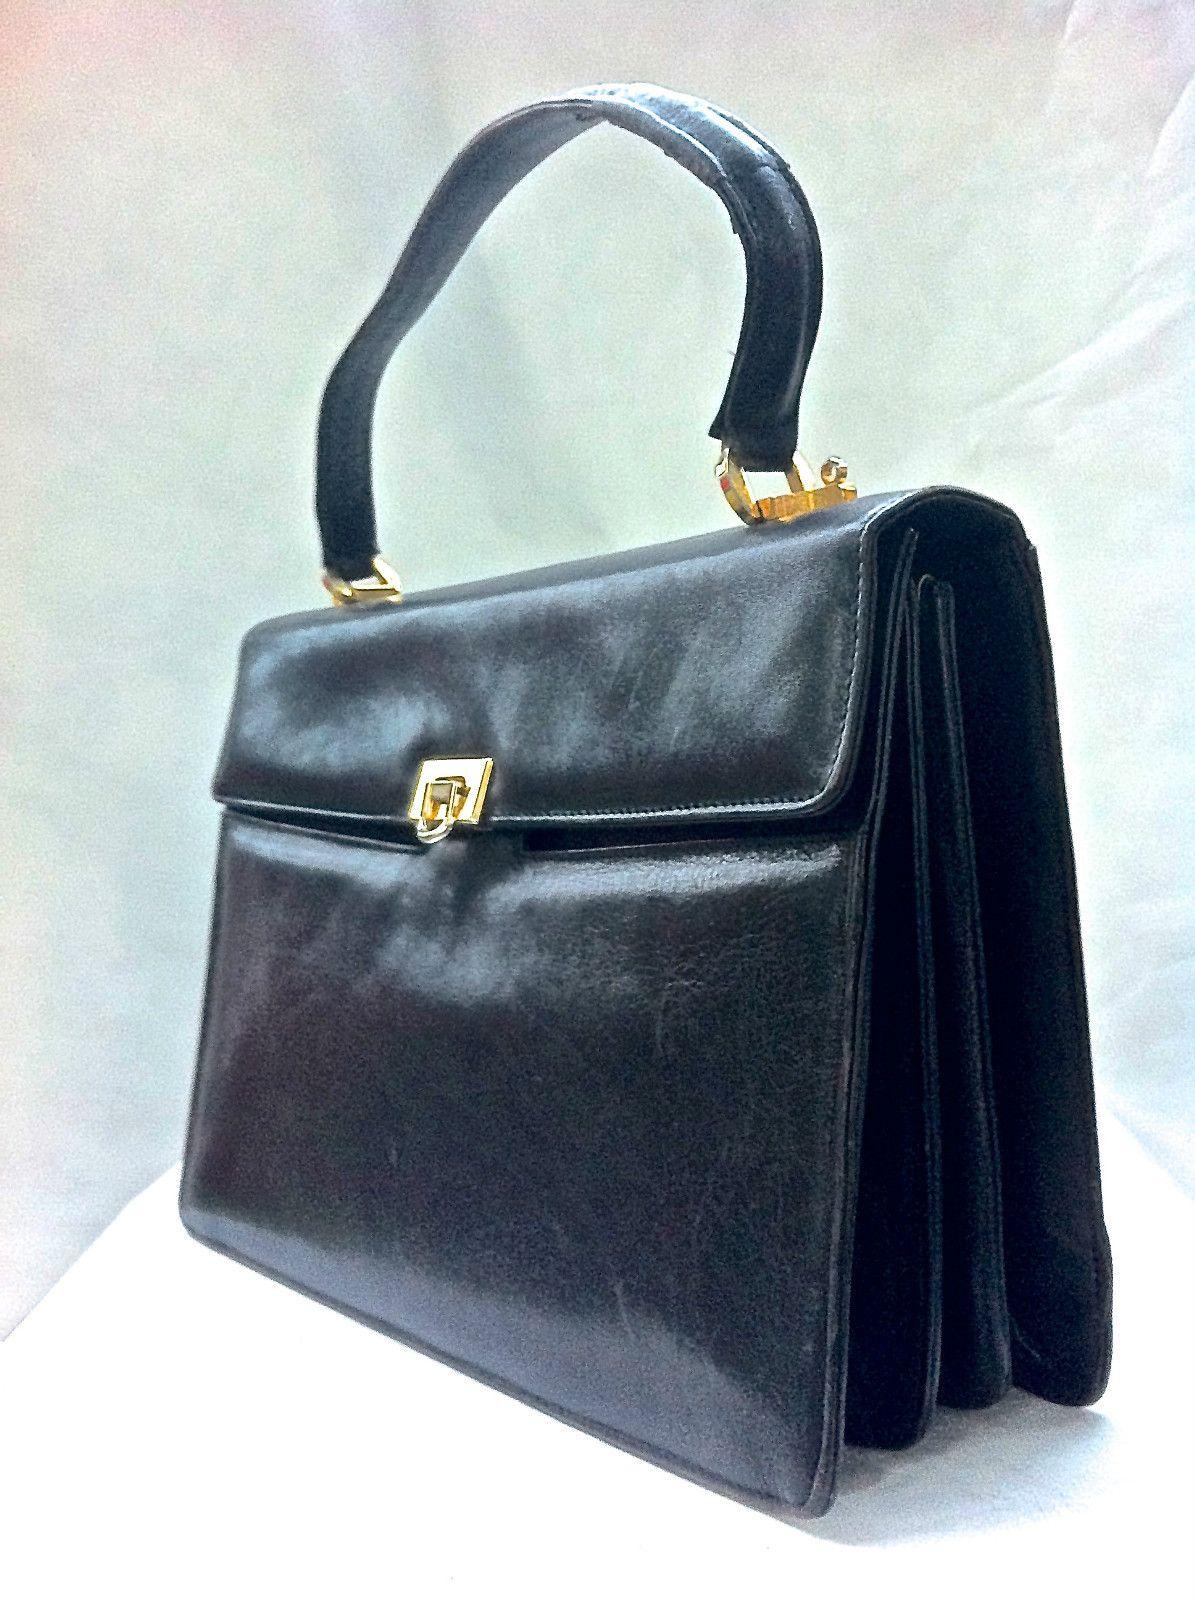 Vtg Glazed Black Leather Italian Handbag Italy Bag Woodward Purse Mad Men Pin Up Ebay